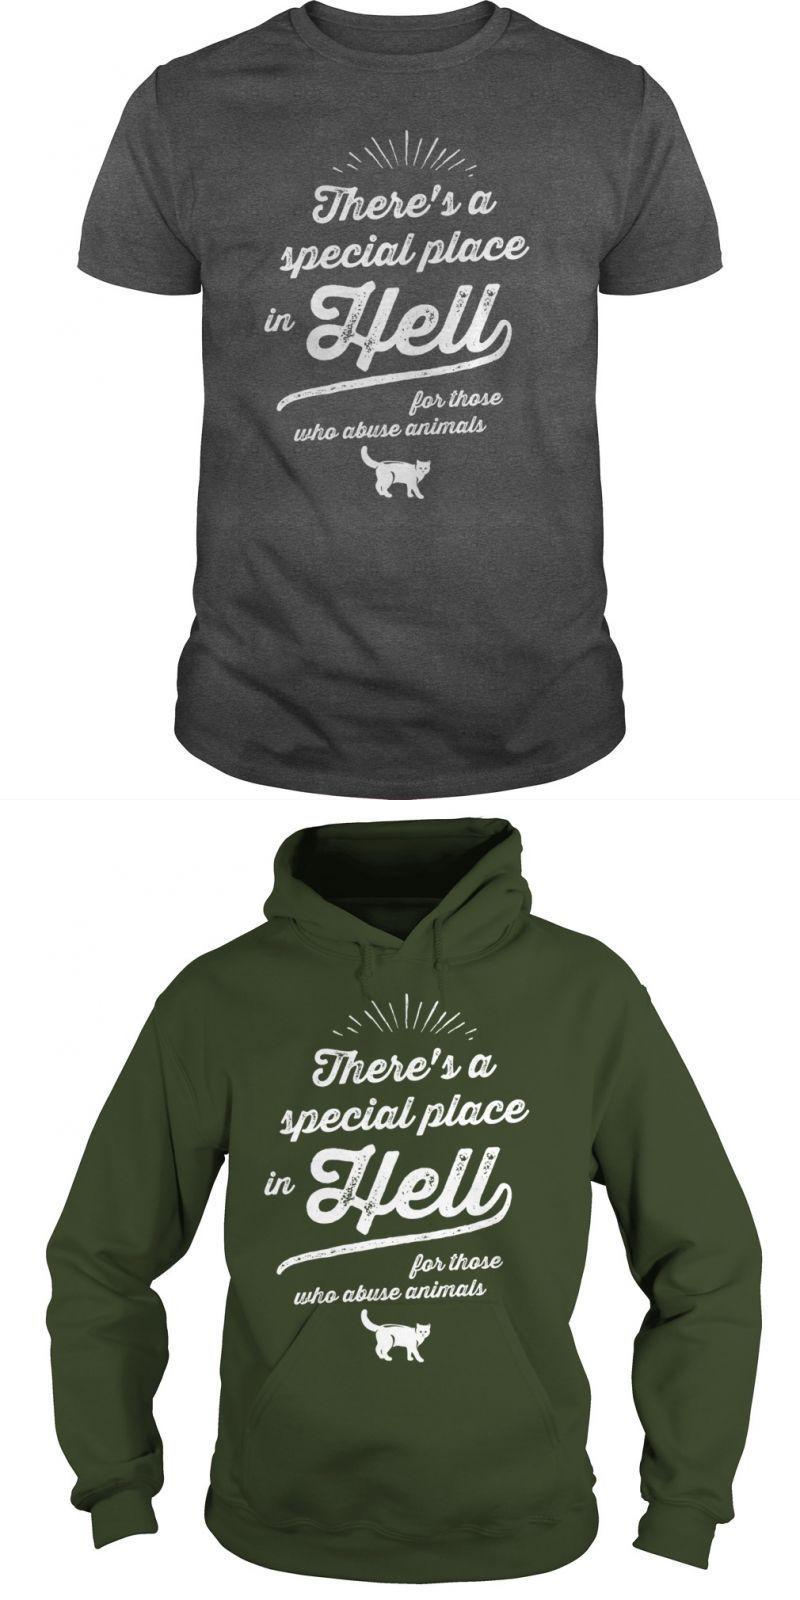 Cats Rock T Shirt Cats3 T Shirt Cat T Shirt Design I Love